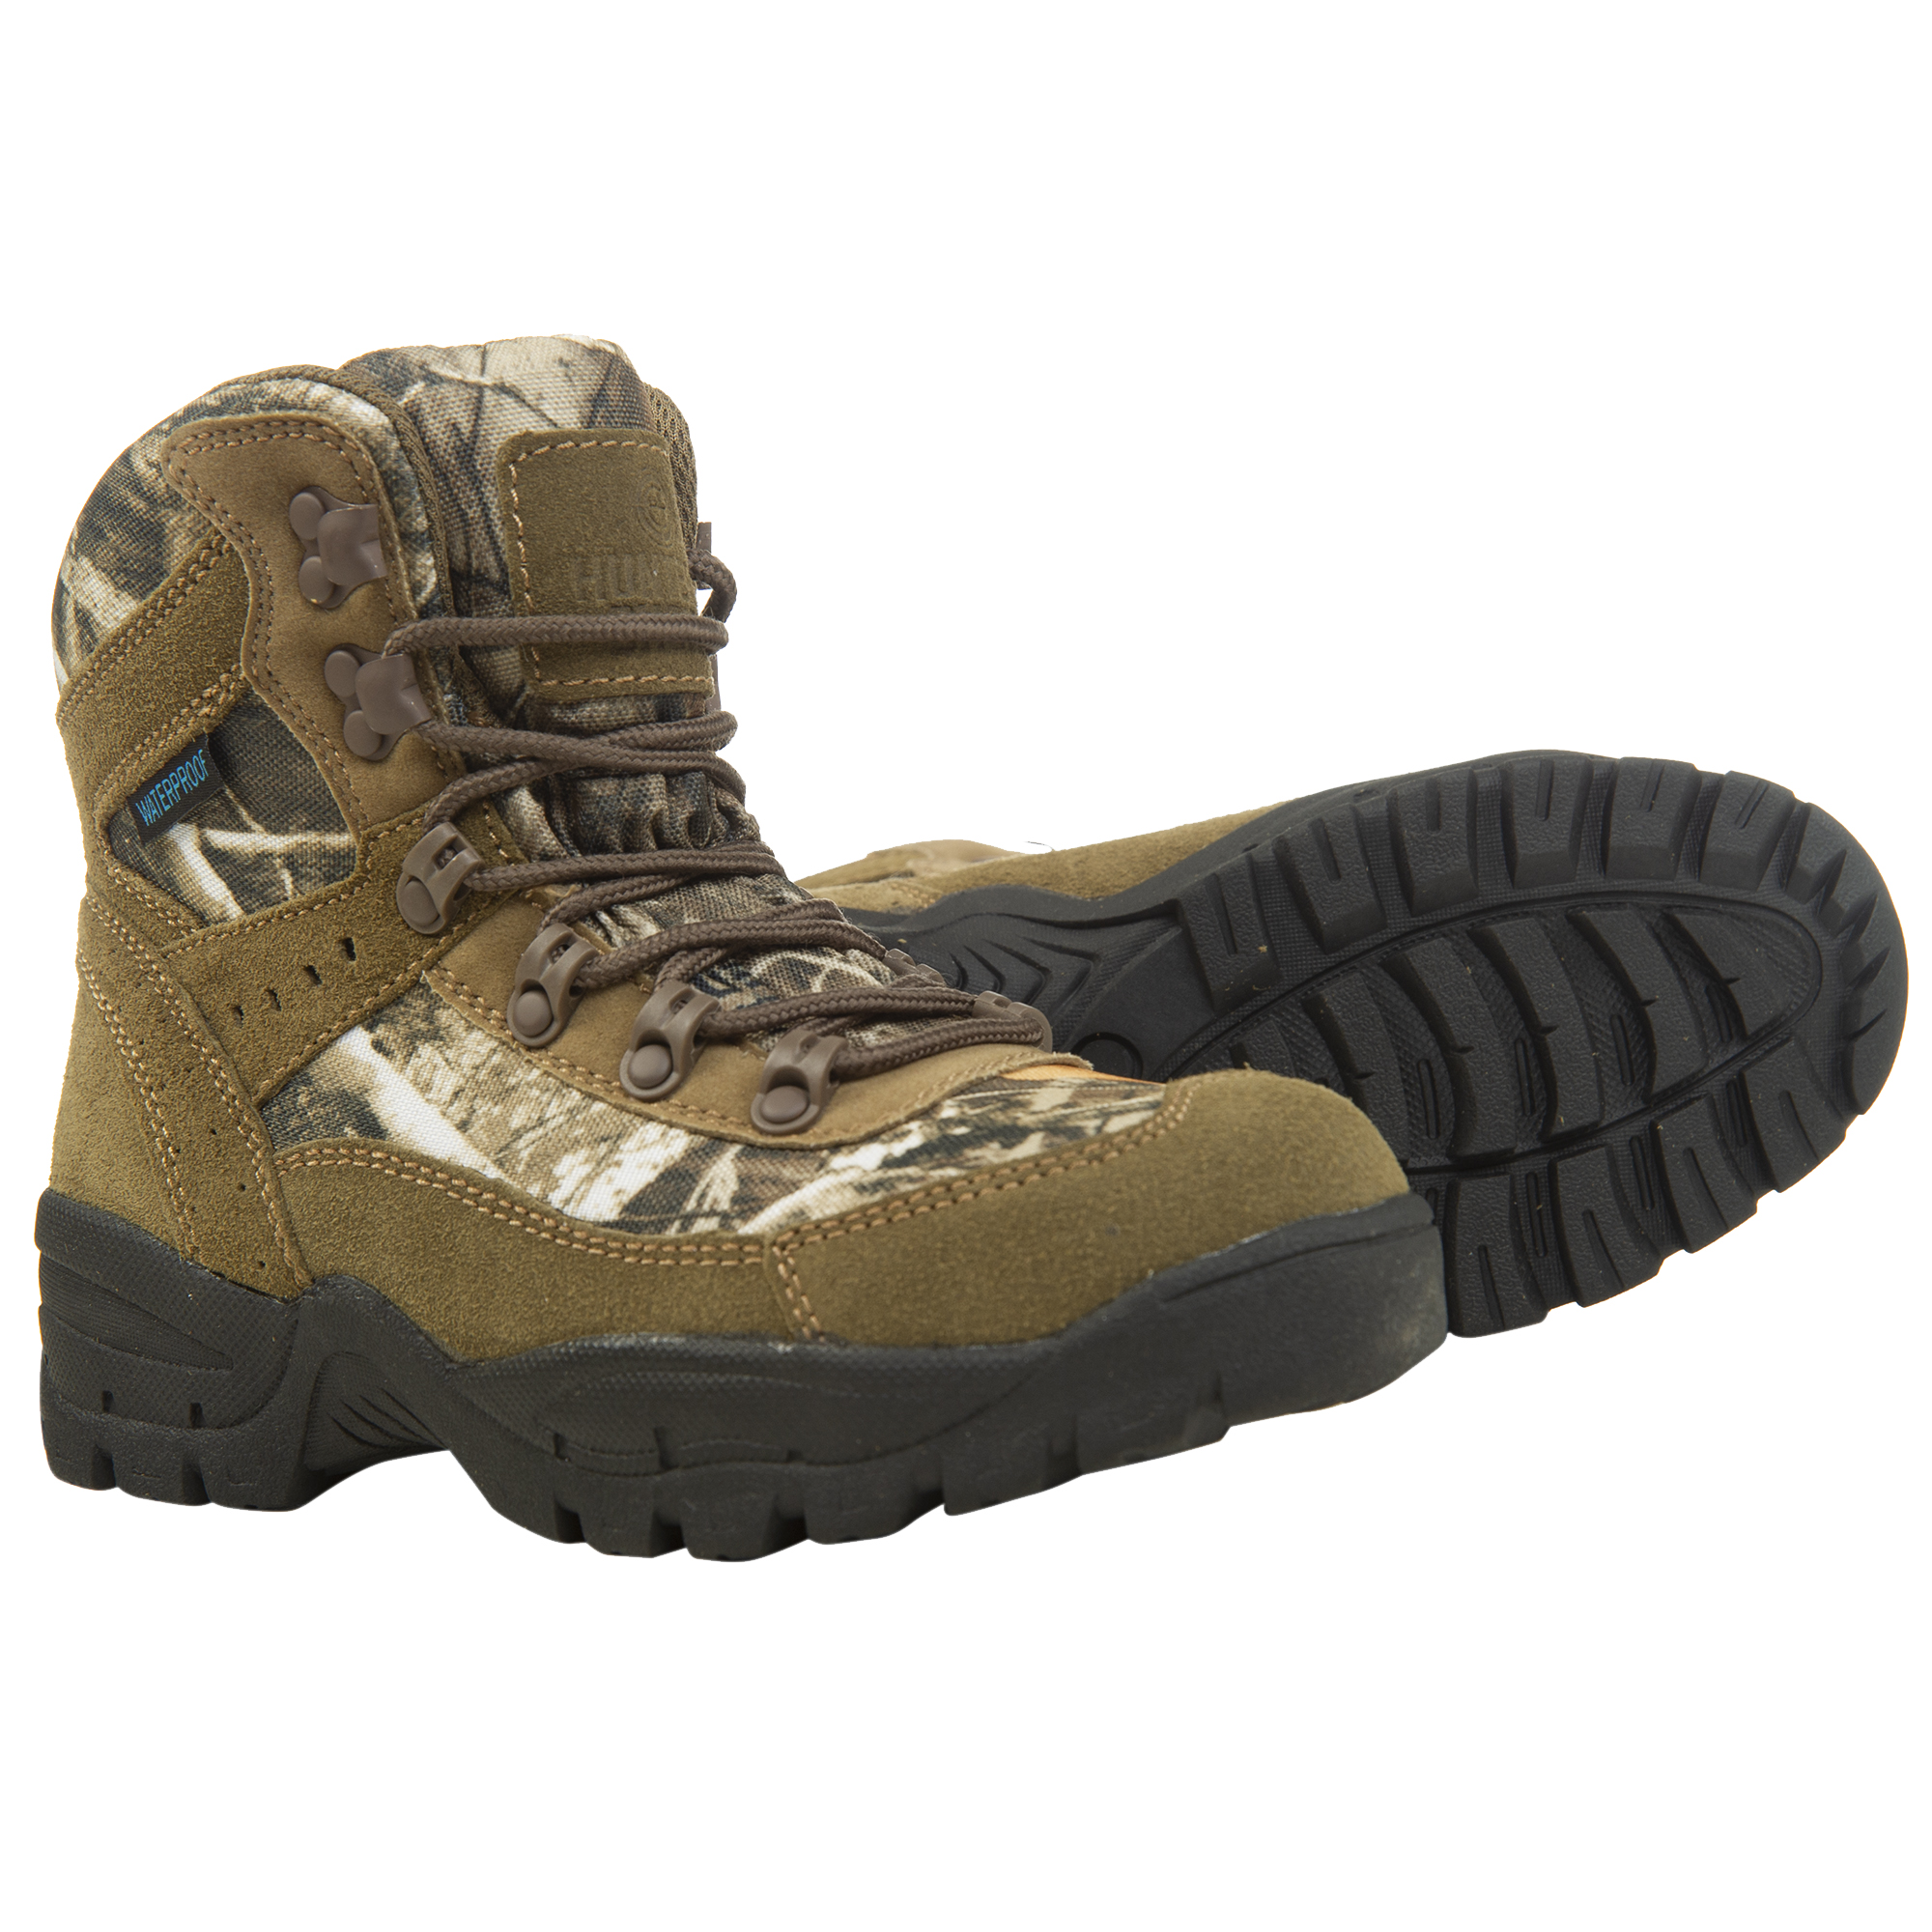 Hunter's Choice Women's 7″ Venari Waterproof Field Boot